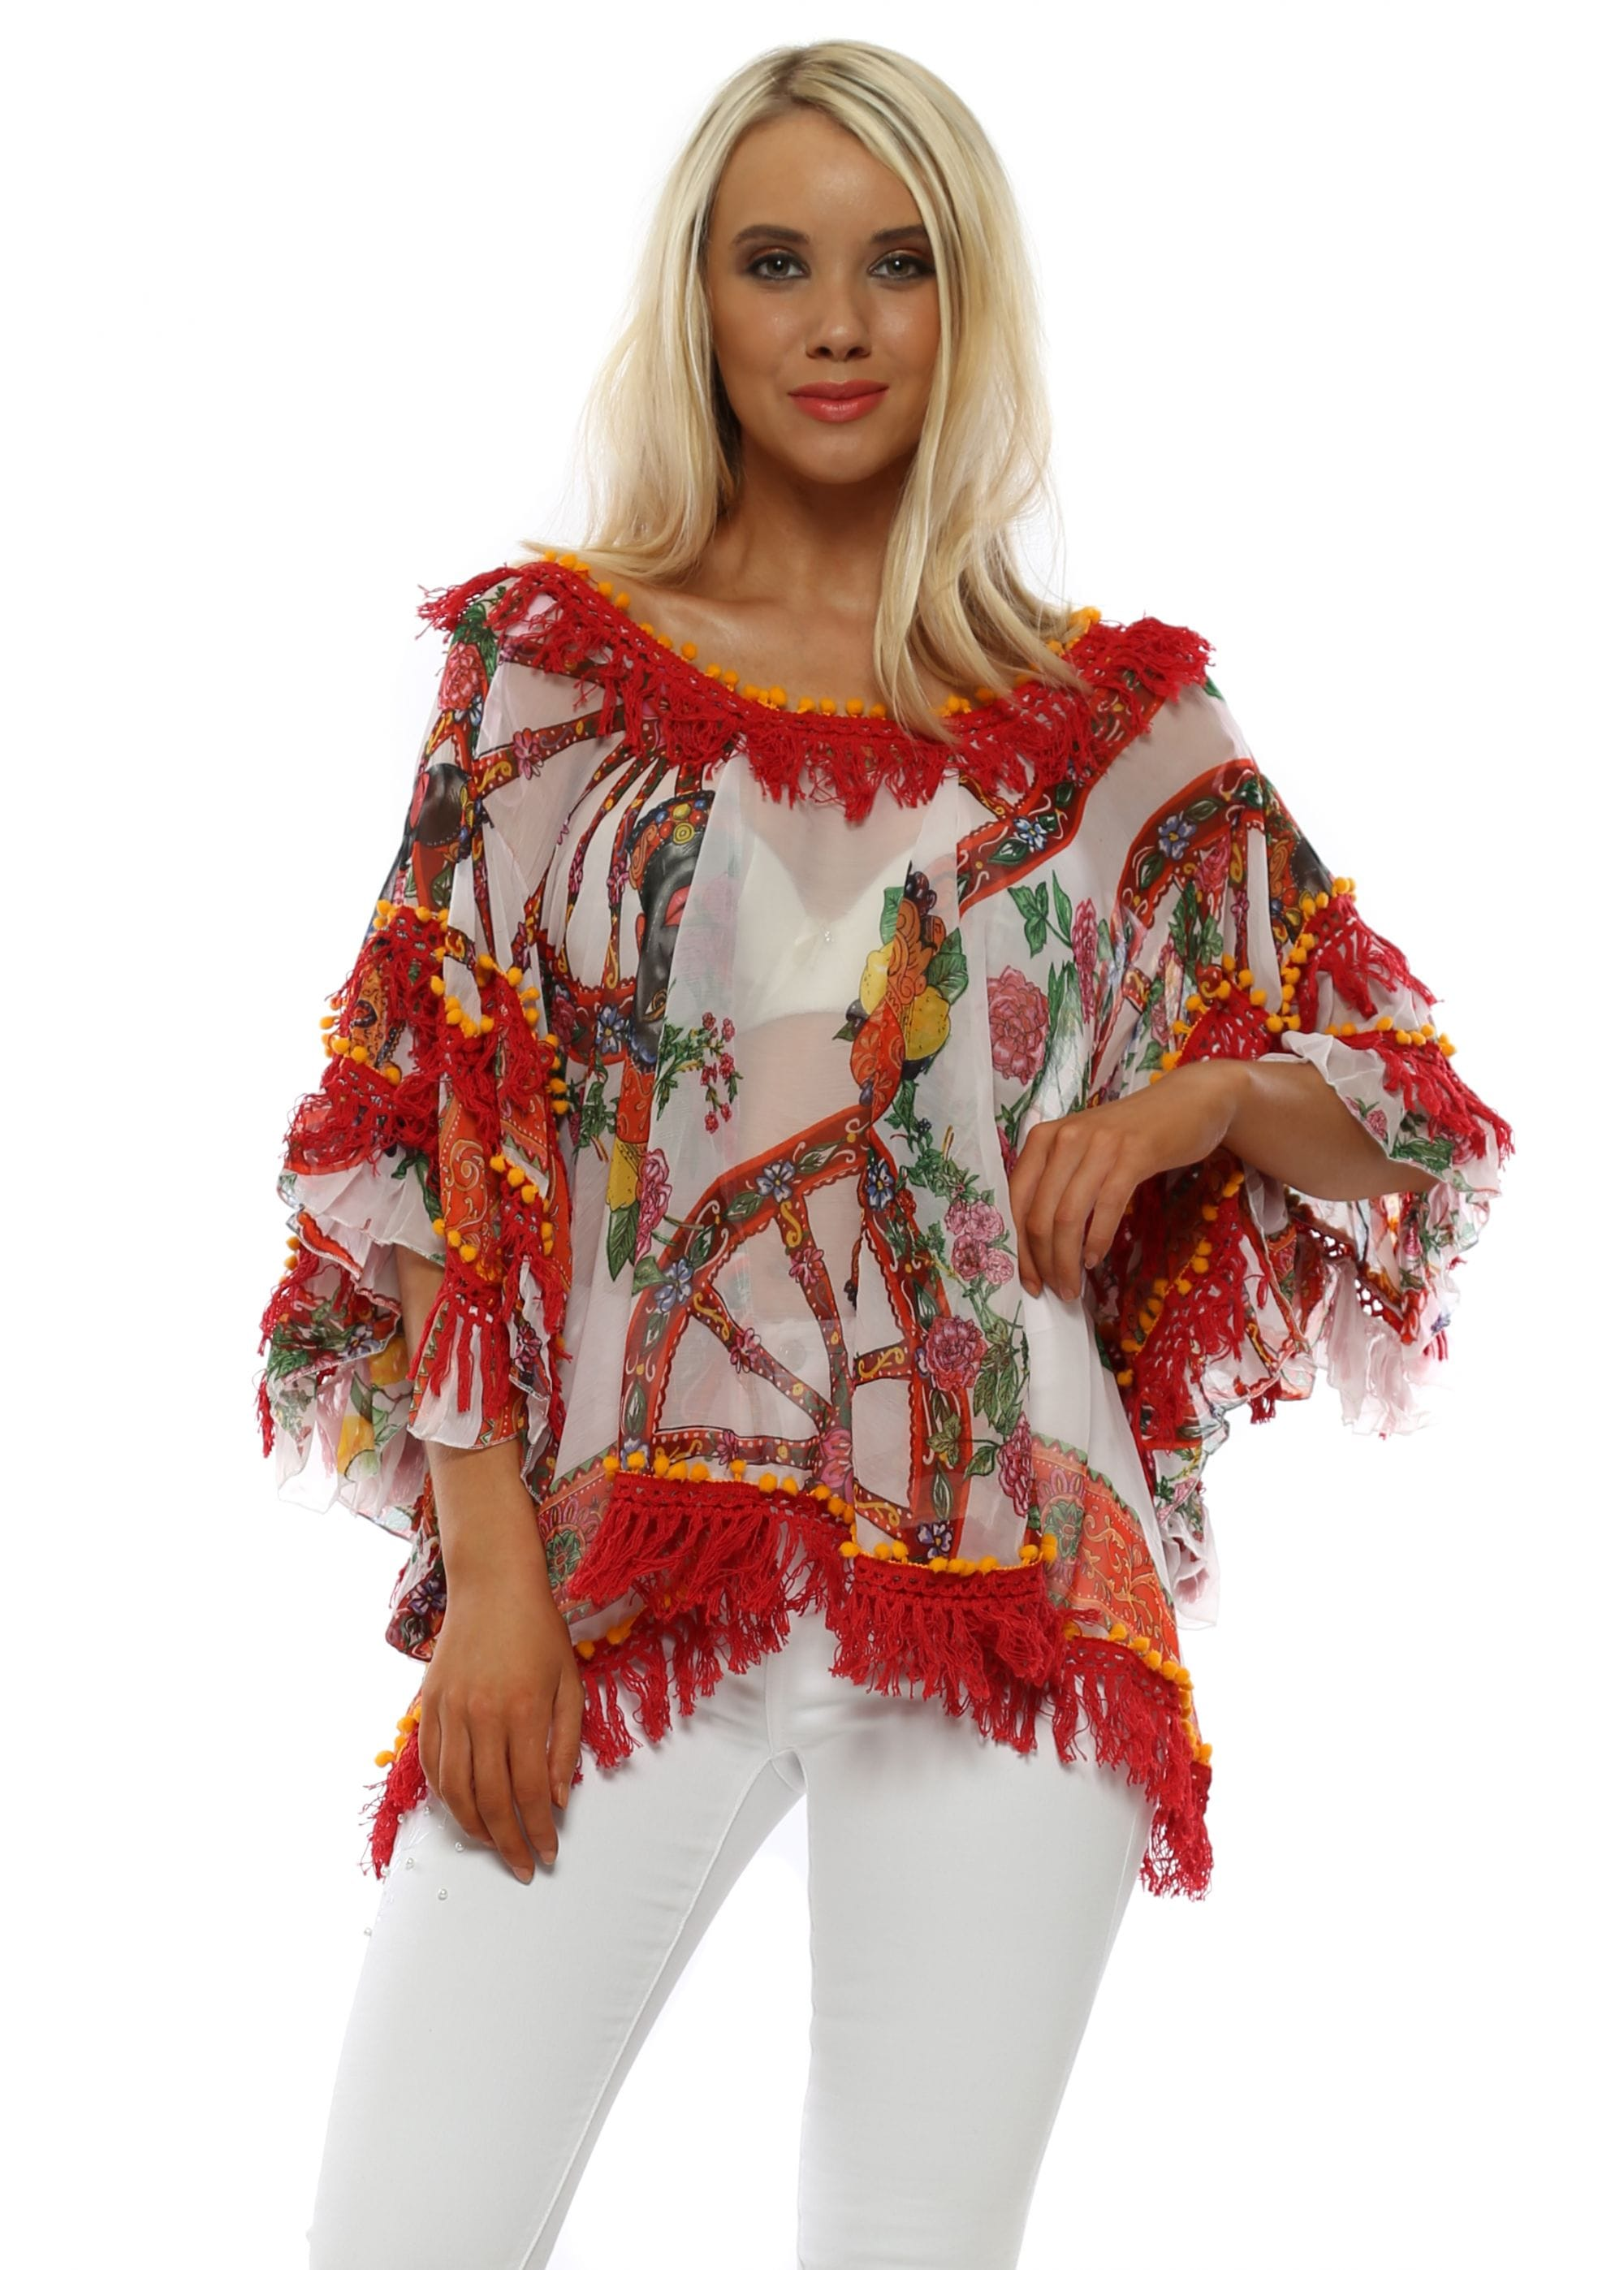 36e91be81d Antica Sartoria   Beach Top   Red Tassel Top   Designer Desirables